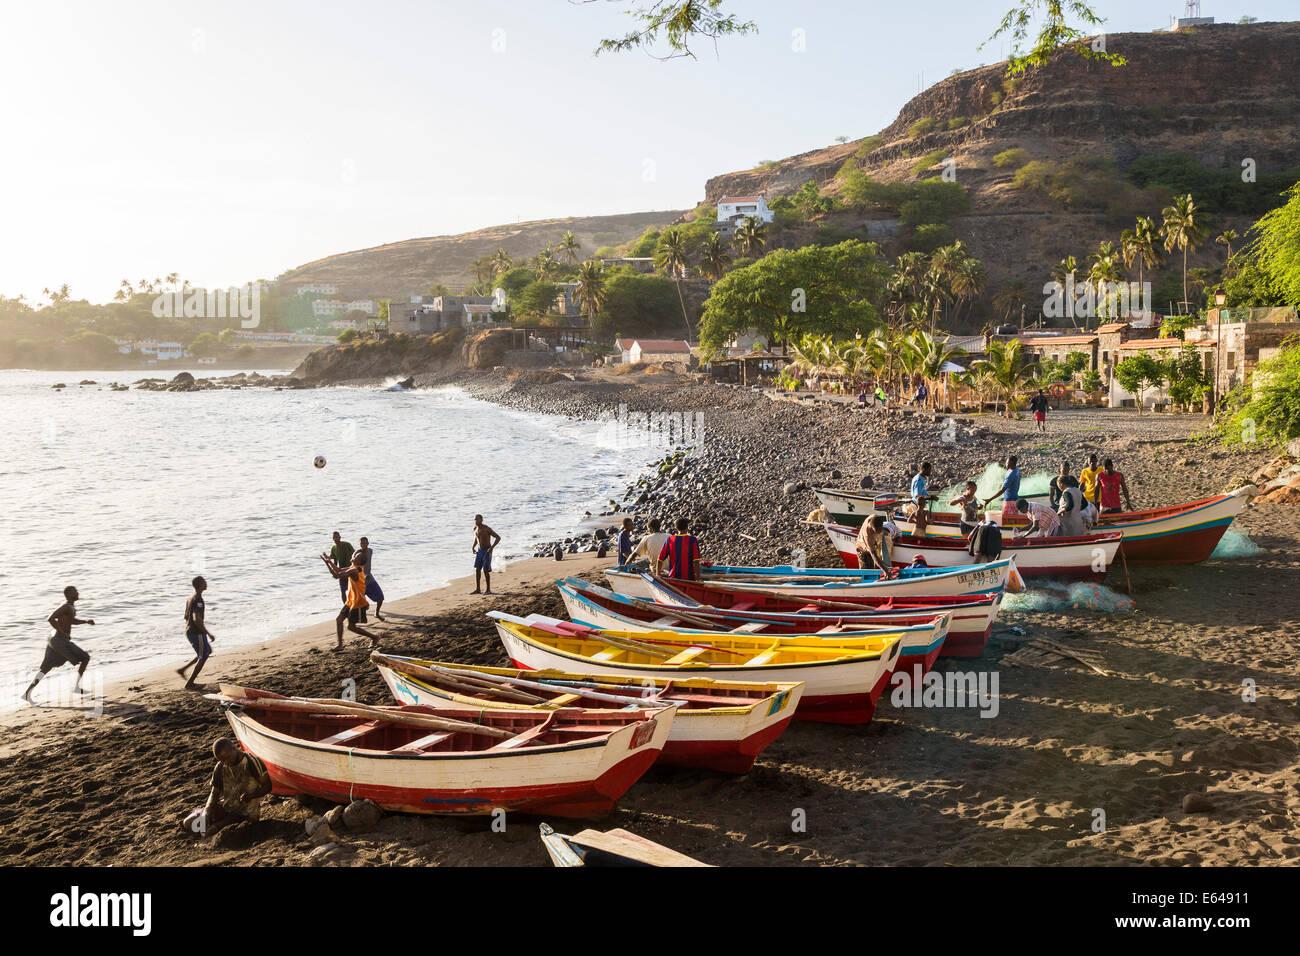 Fishing boats on beach, Cidade Velha, Santiago Island, Cape Verde - Stock Image